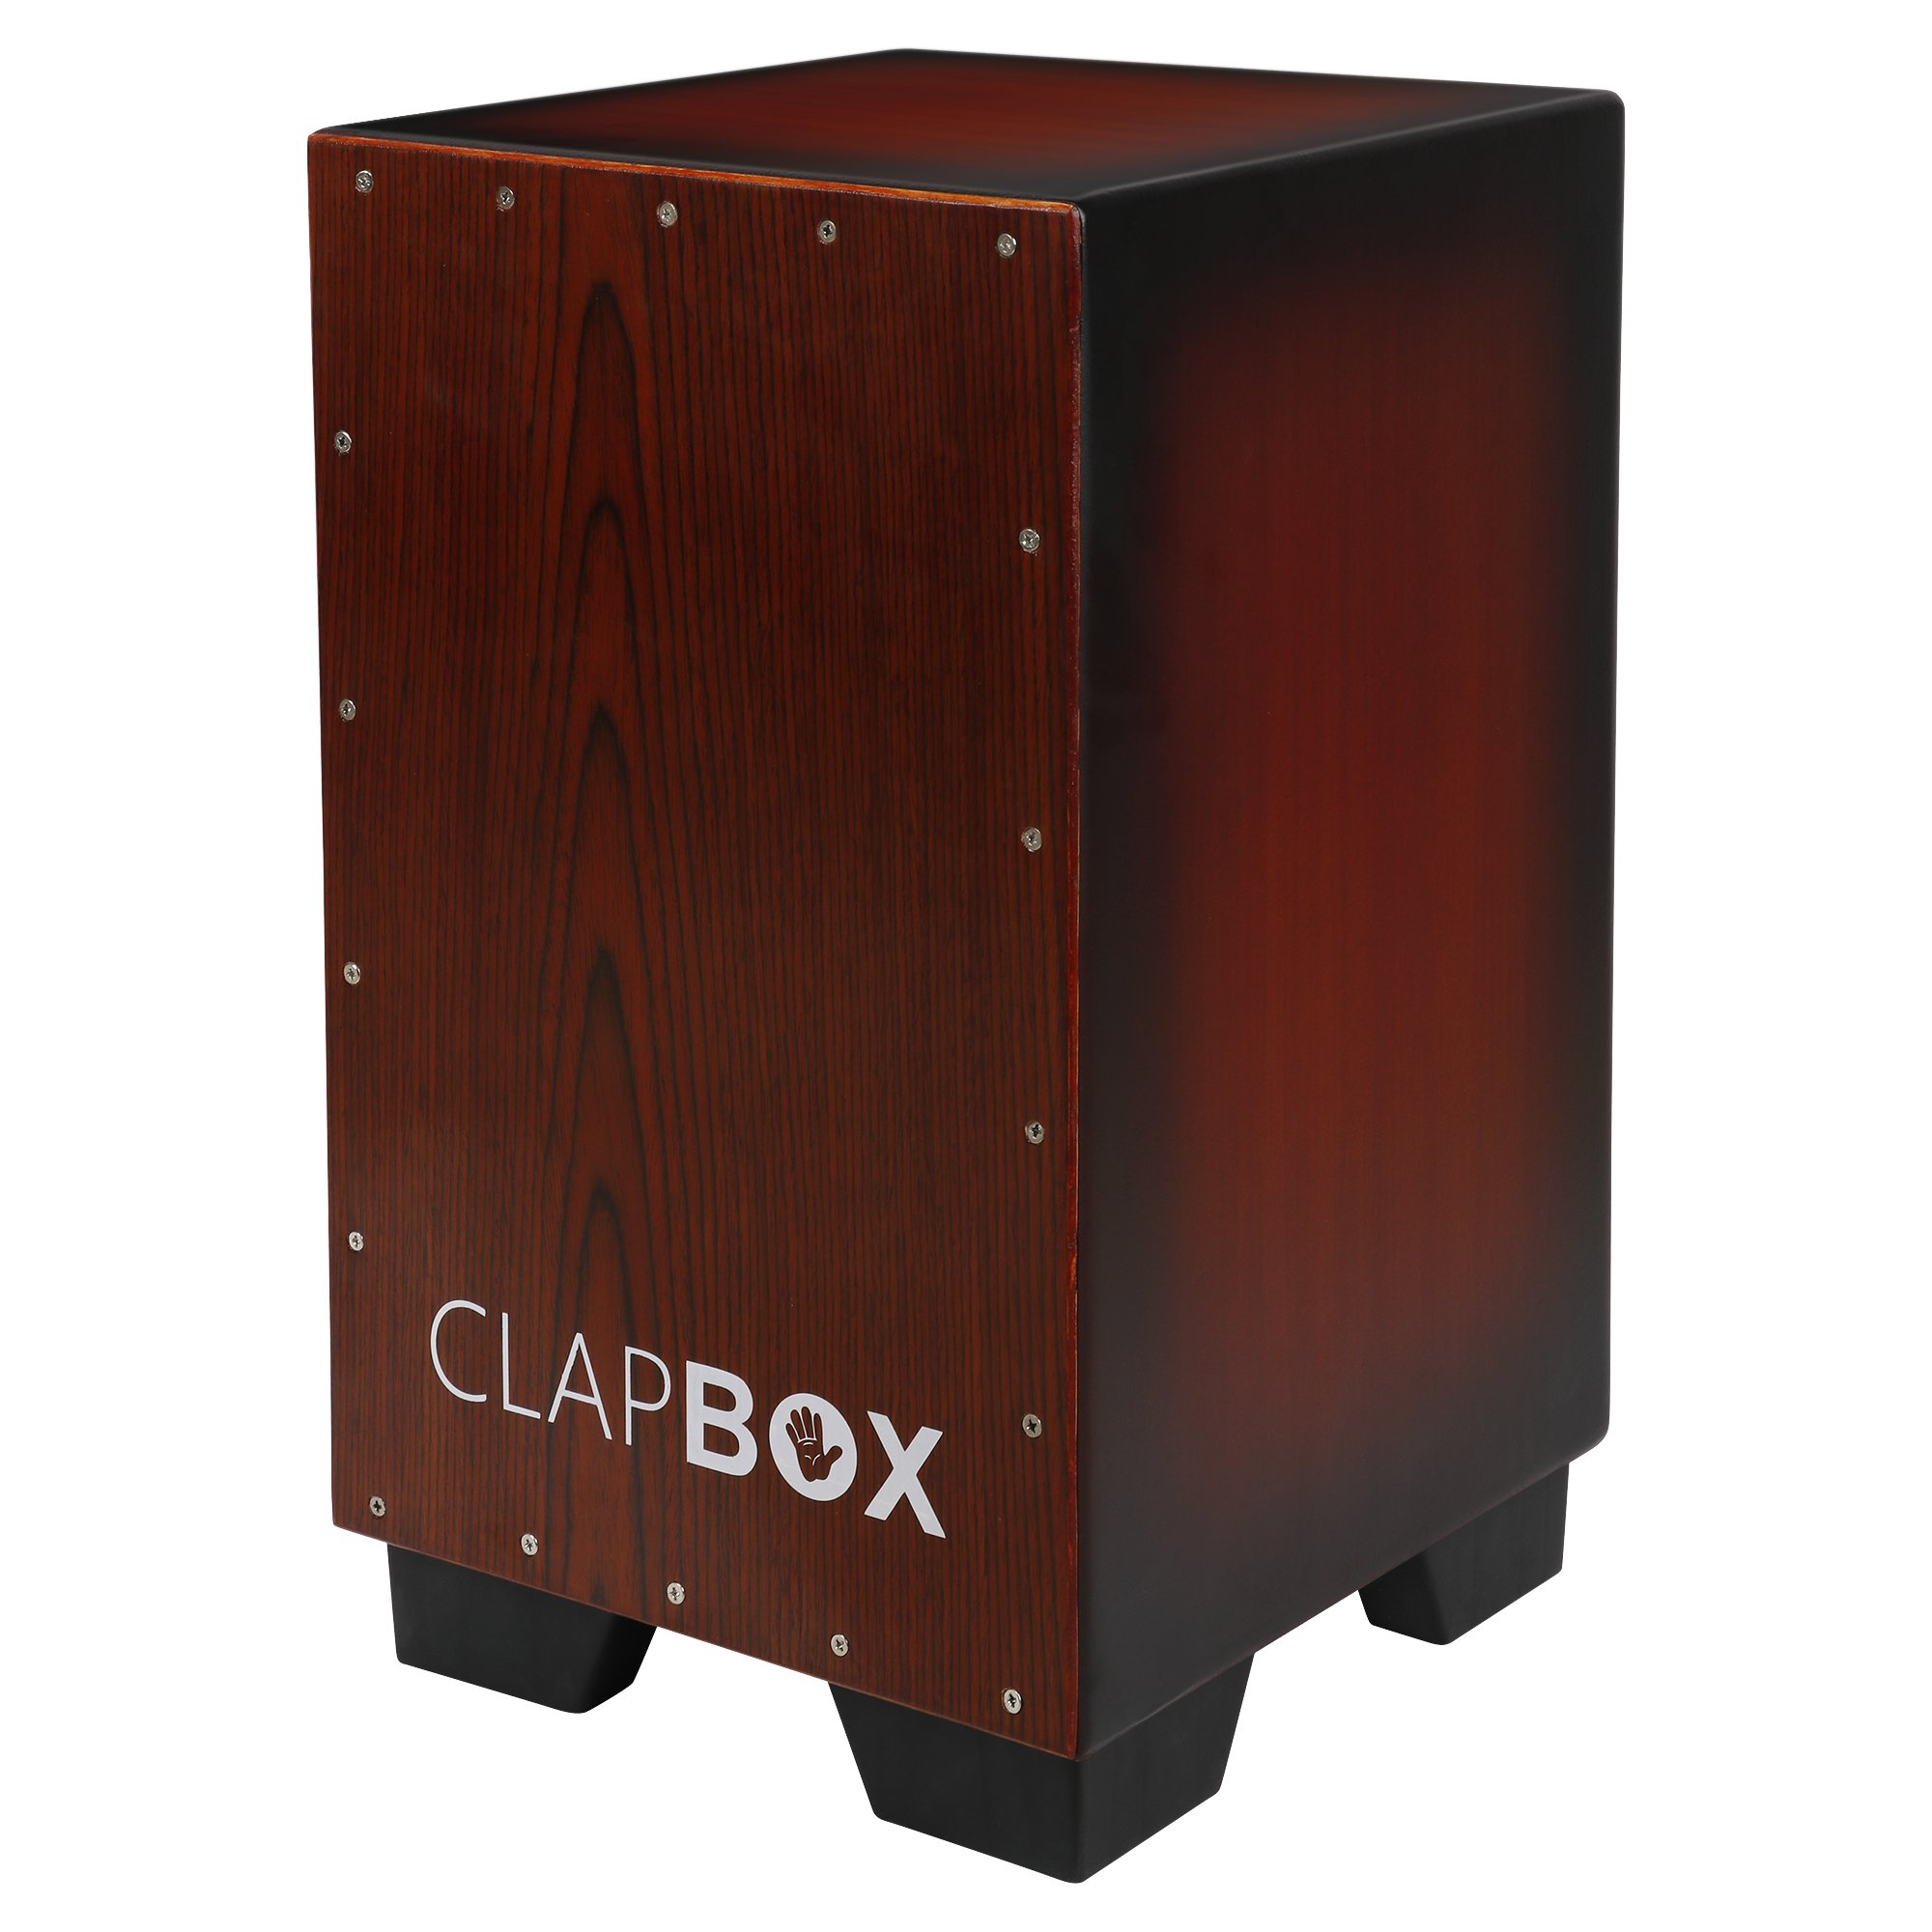 Clapbox Cajon CB11 -Sunburst, Oak Wood (H:50 W:30 L:30) - 3 Internal Snares product image